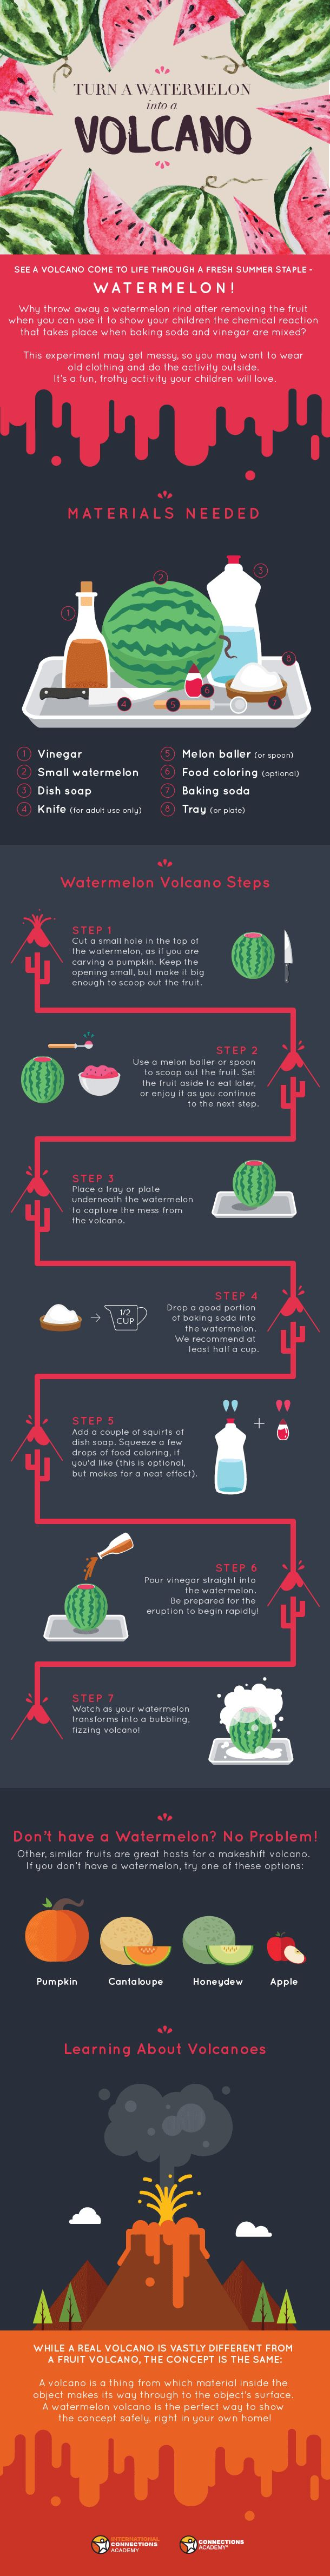 Watermelon Volcano Experiment